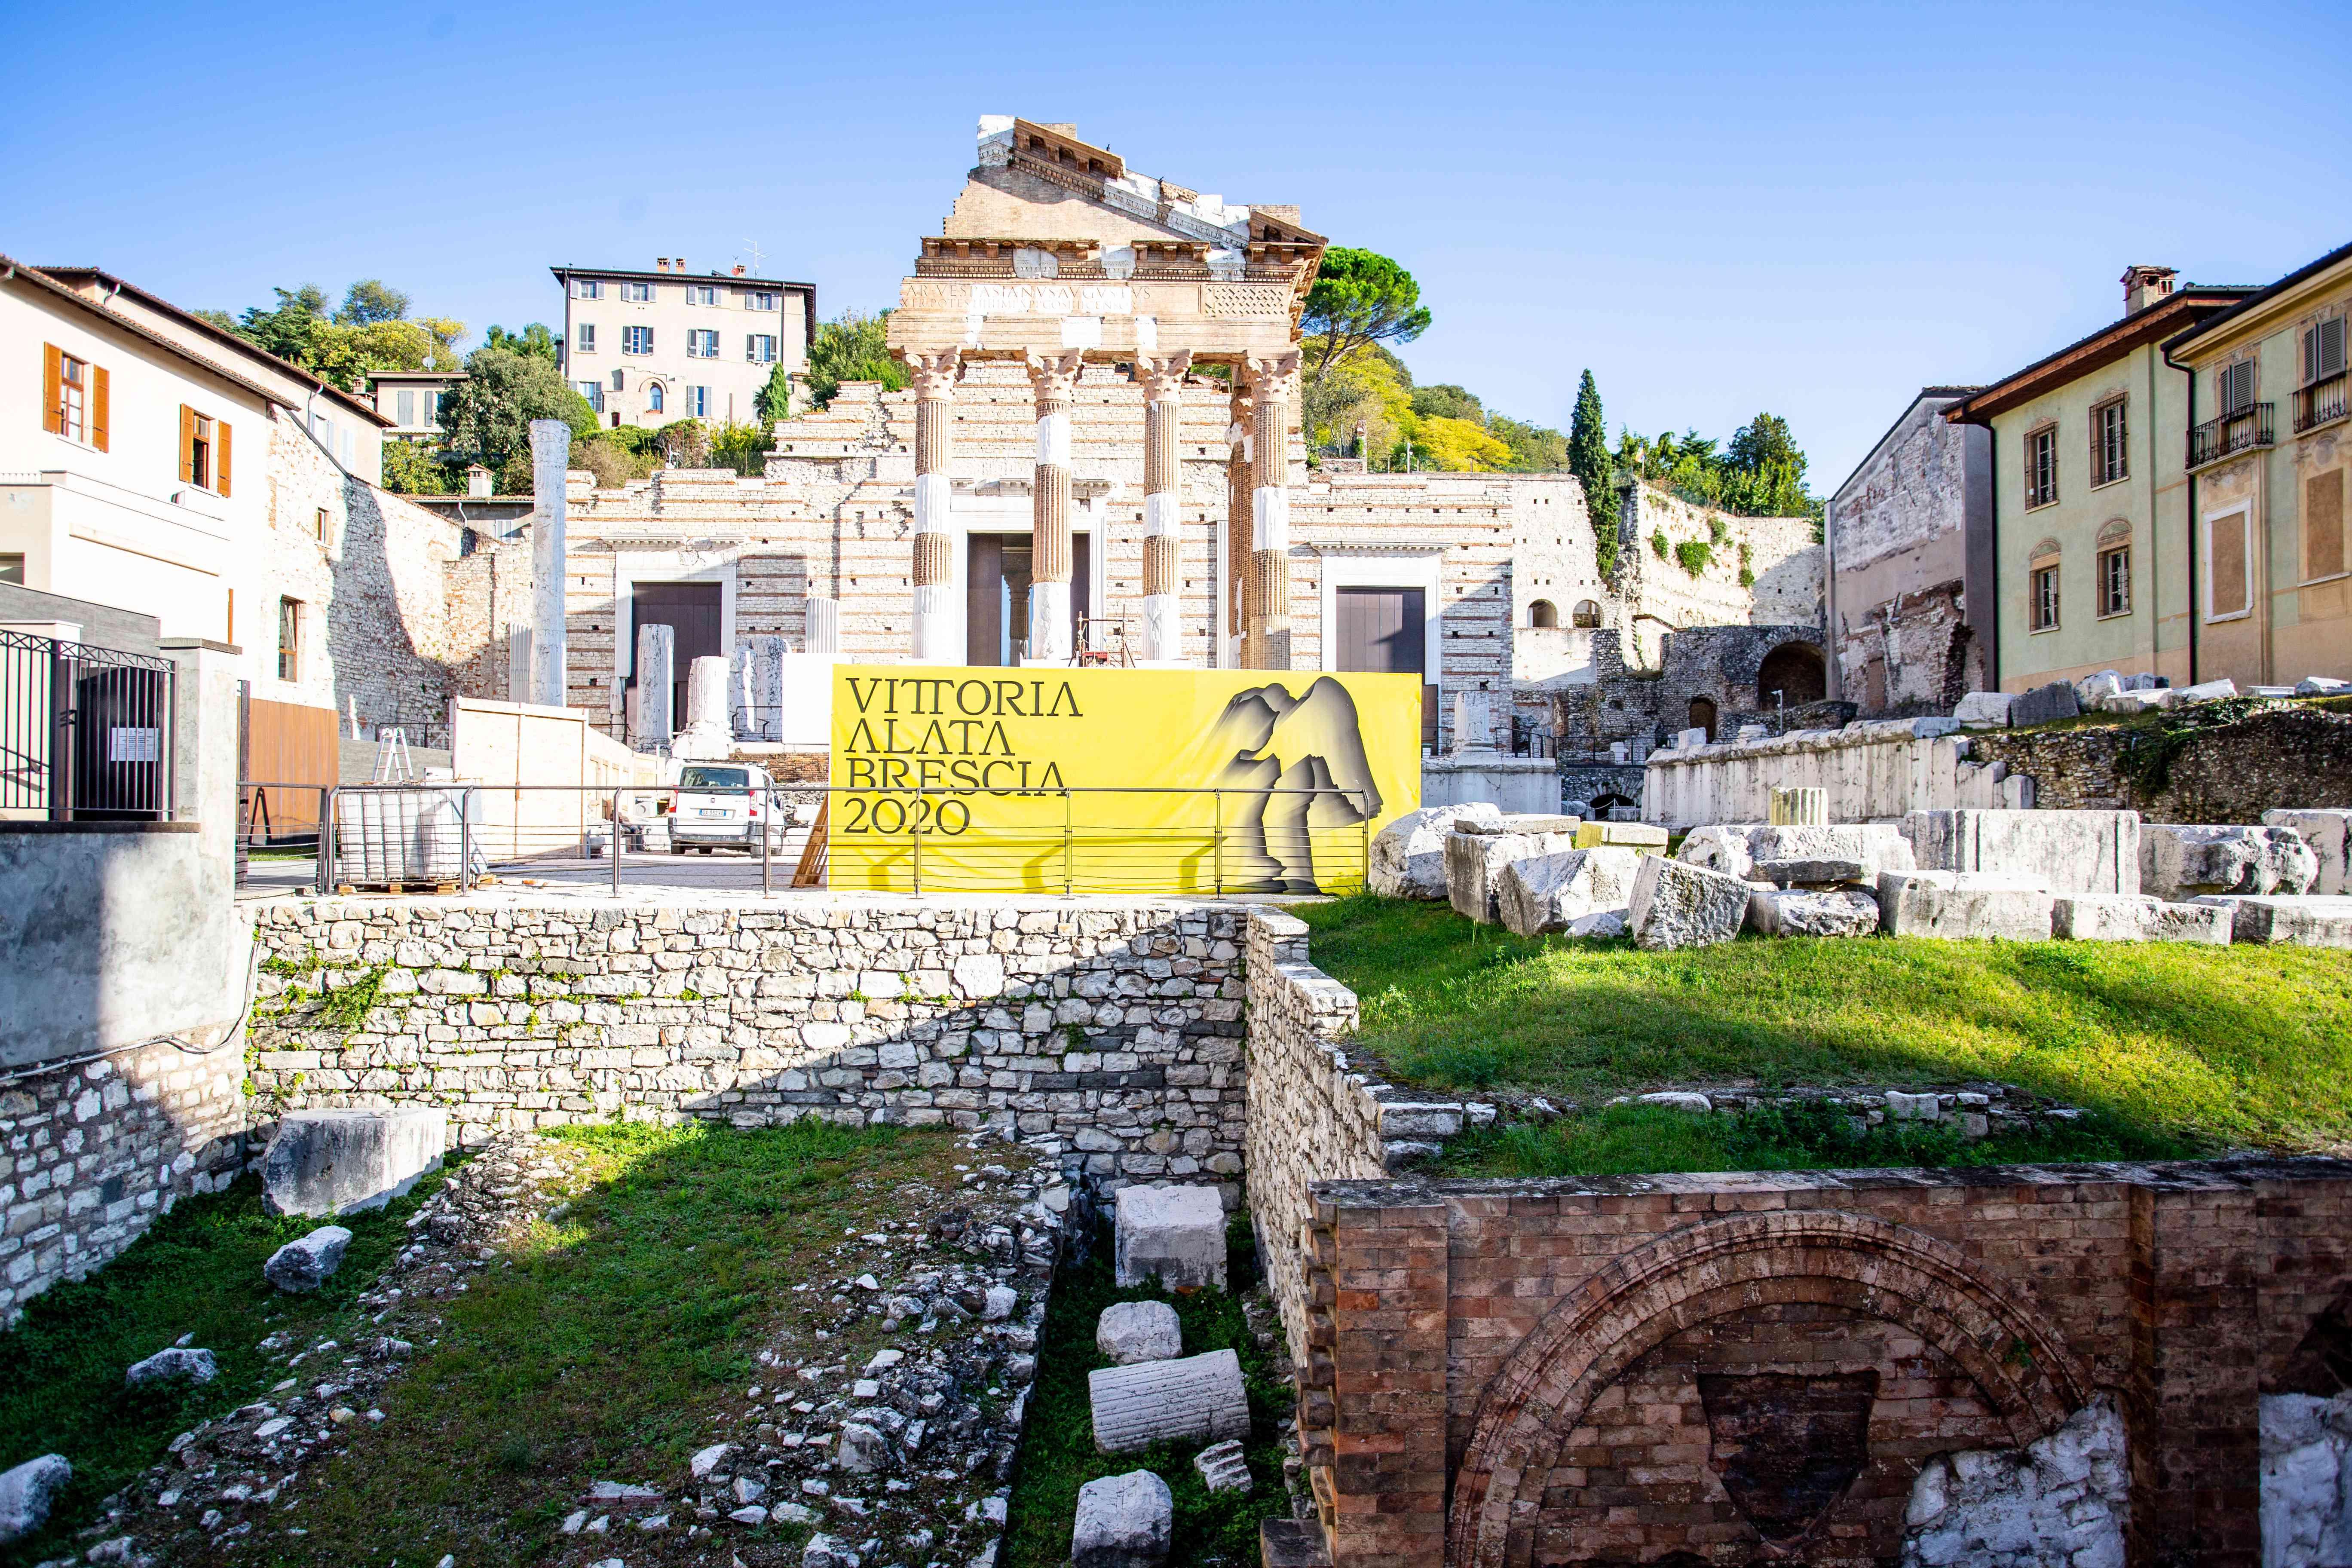 Roman Ruins in Franciacorta, Italy